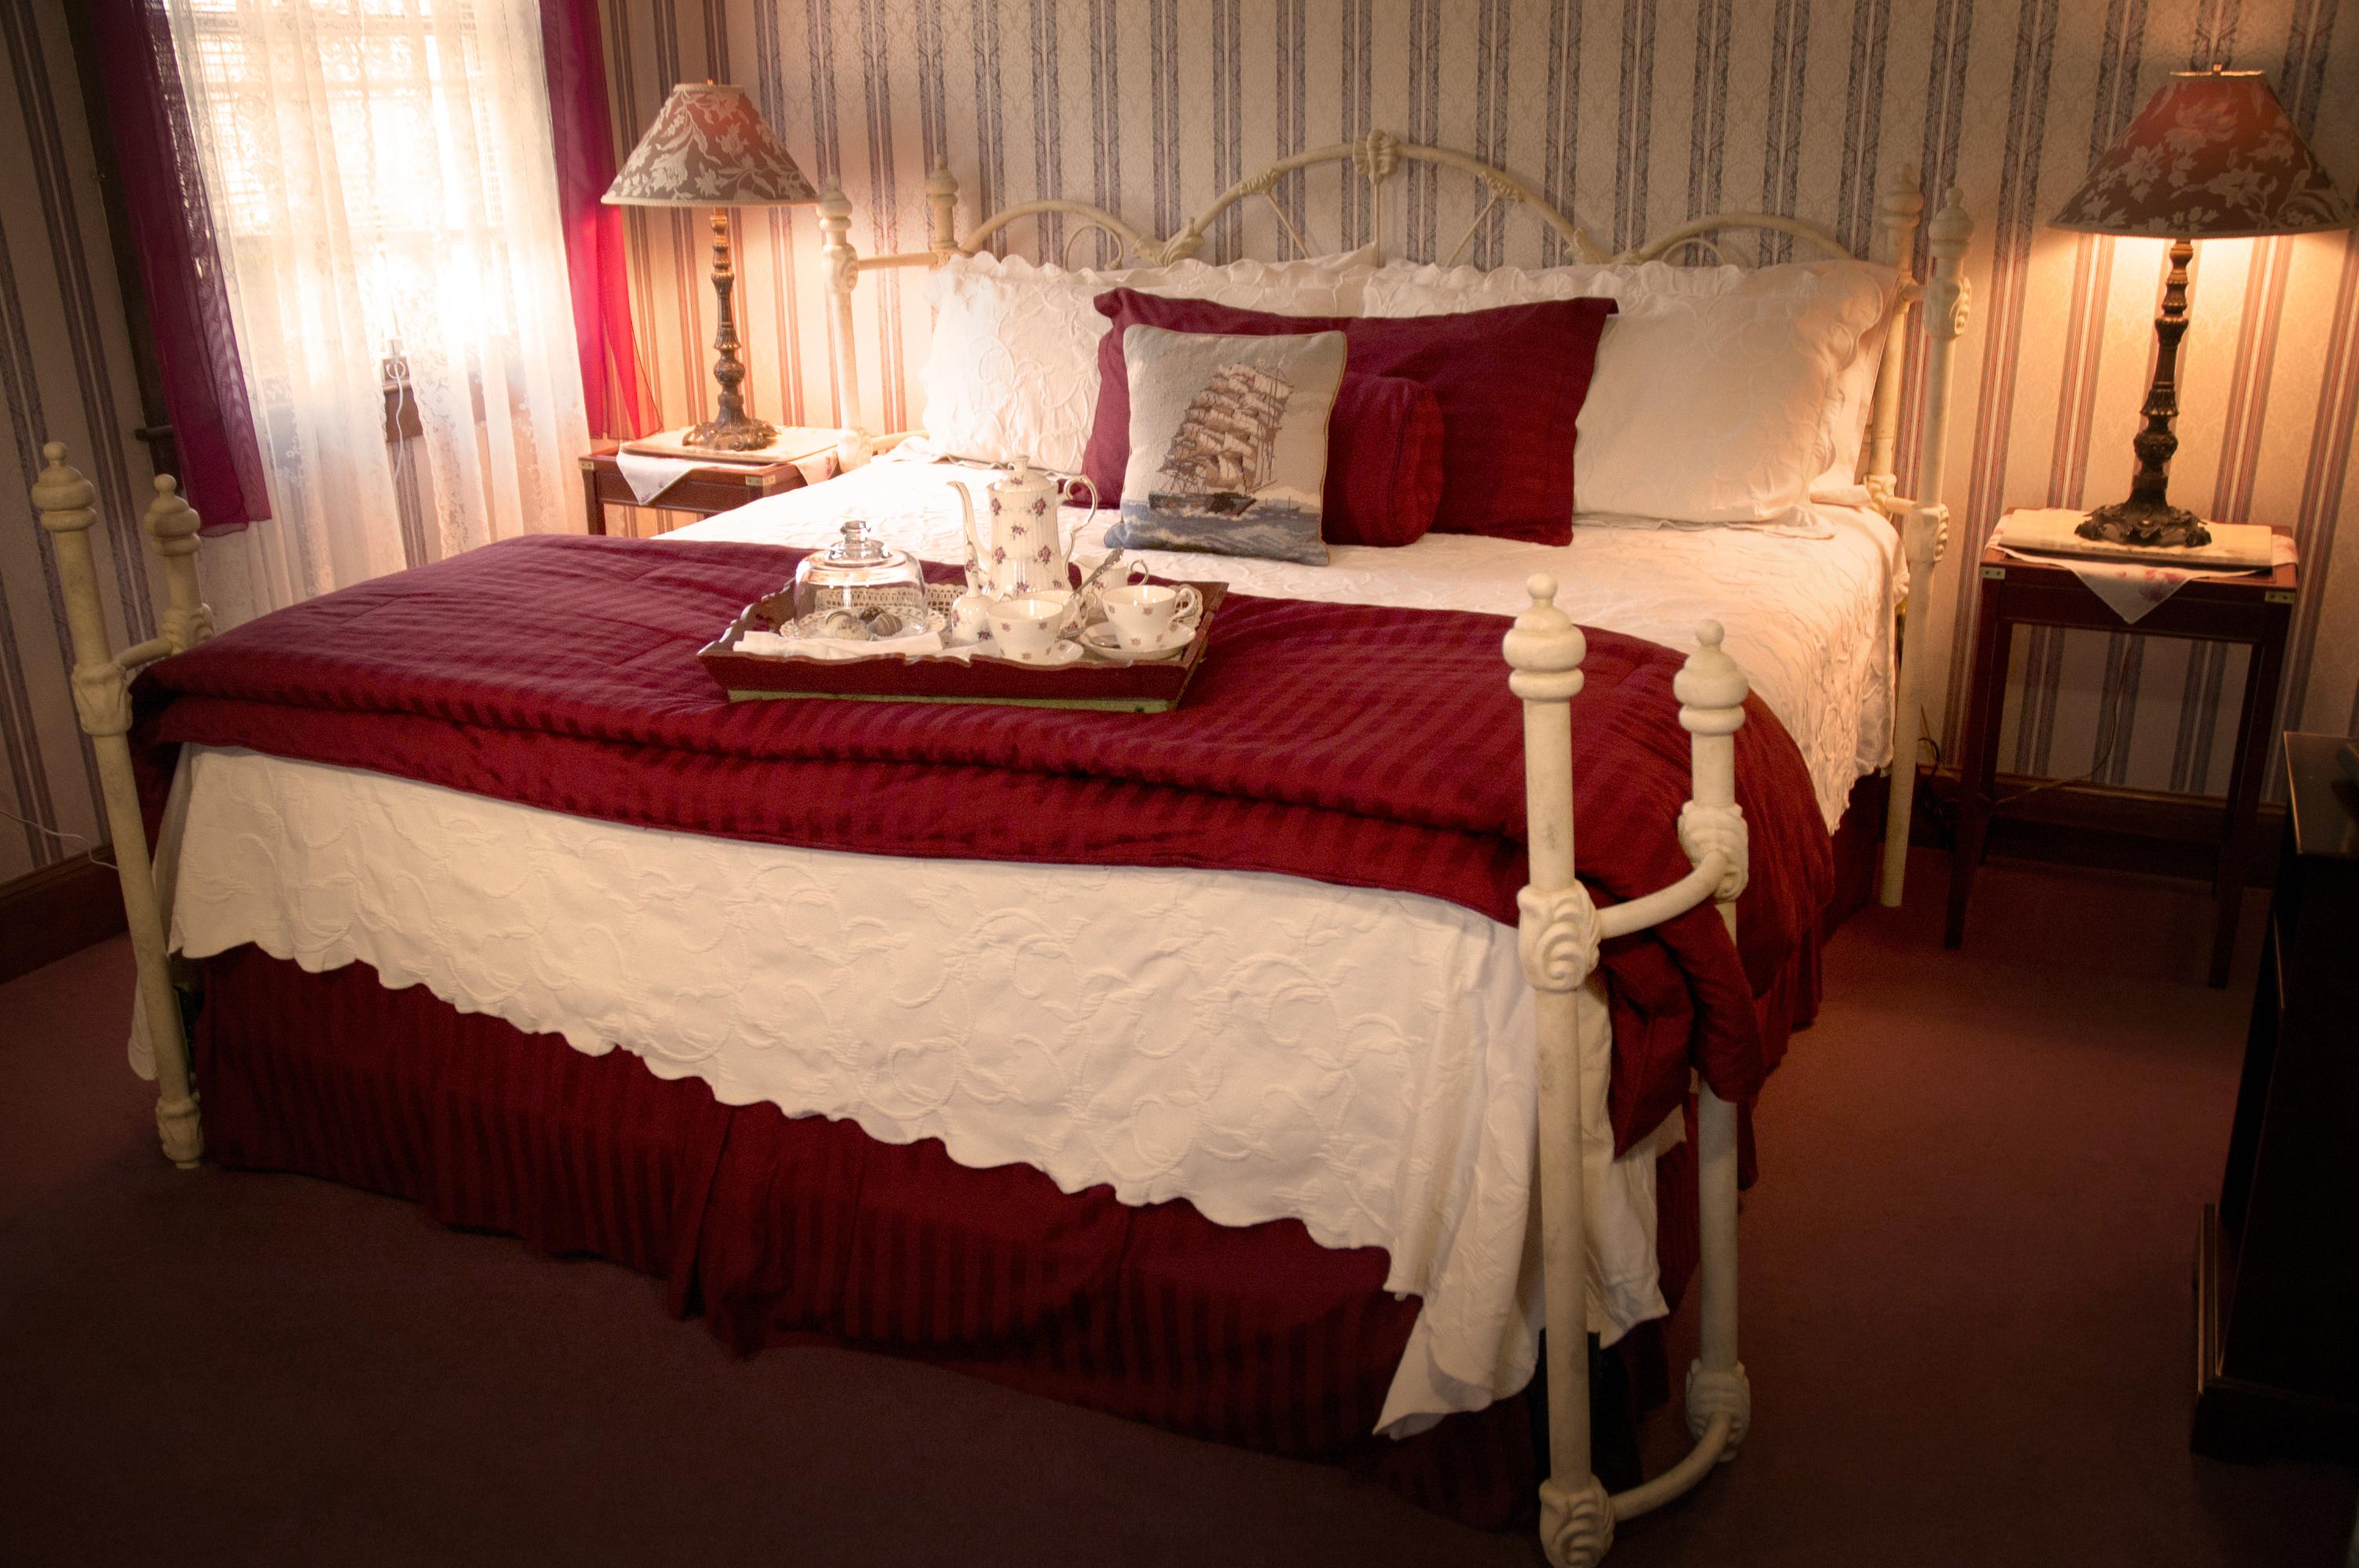 Cape Cod Bedroom 12 King bed, Jacuzzi Bathtub